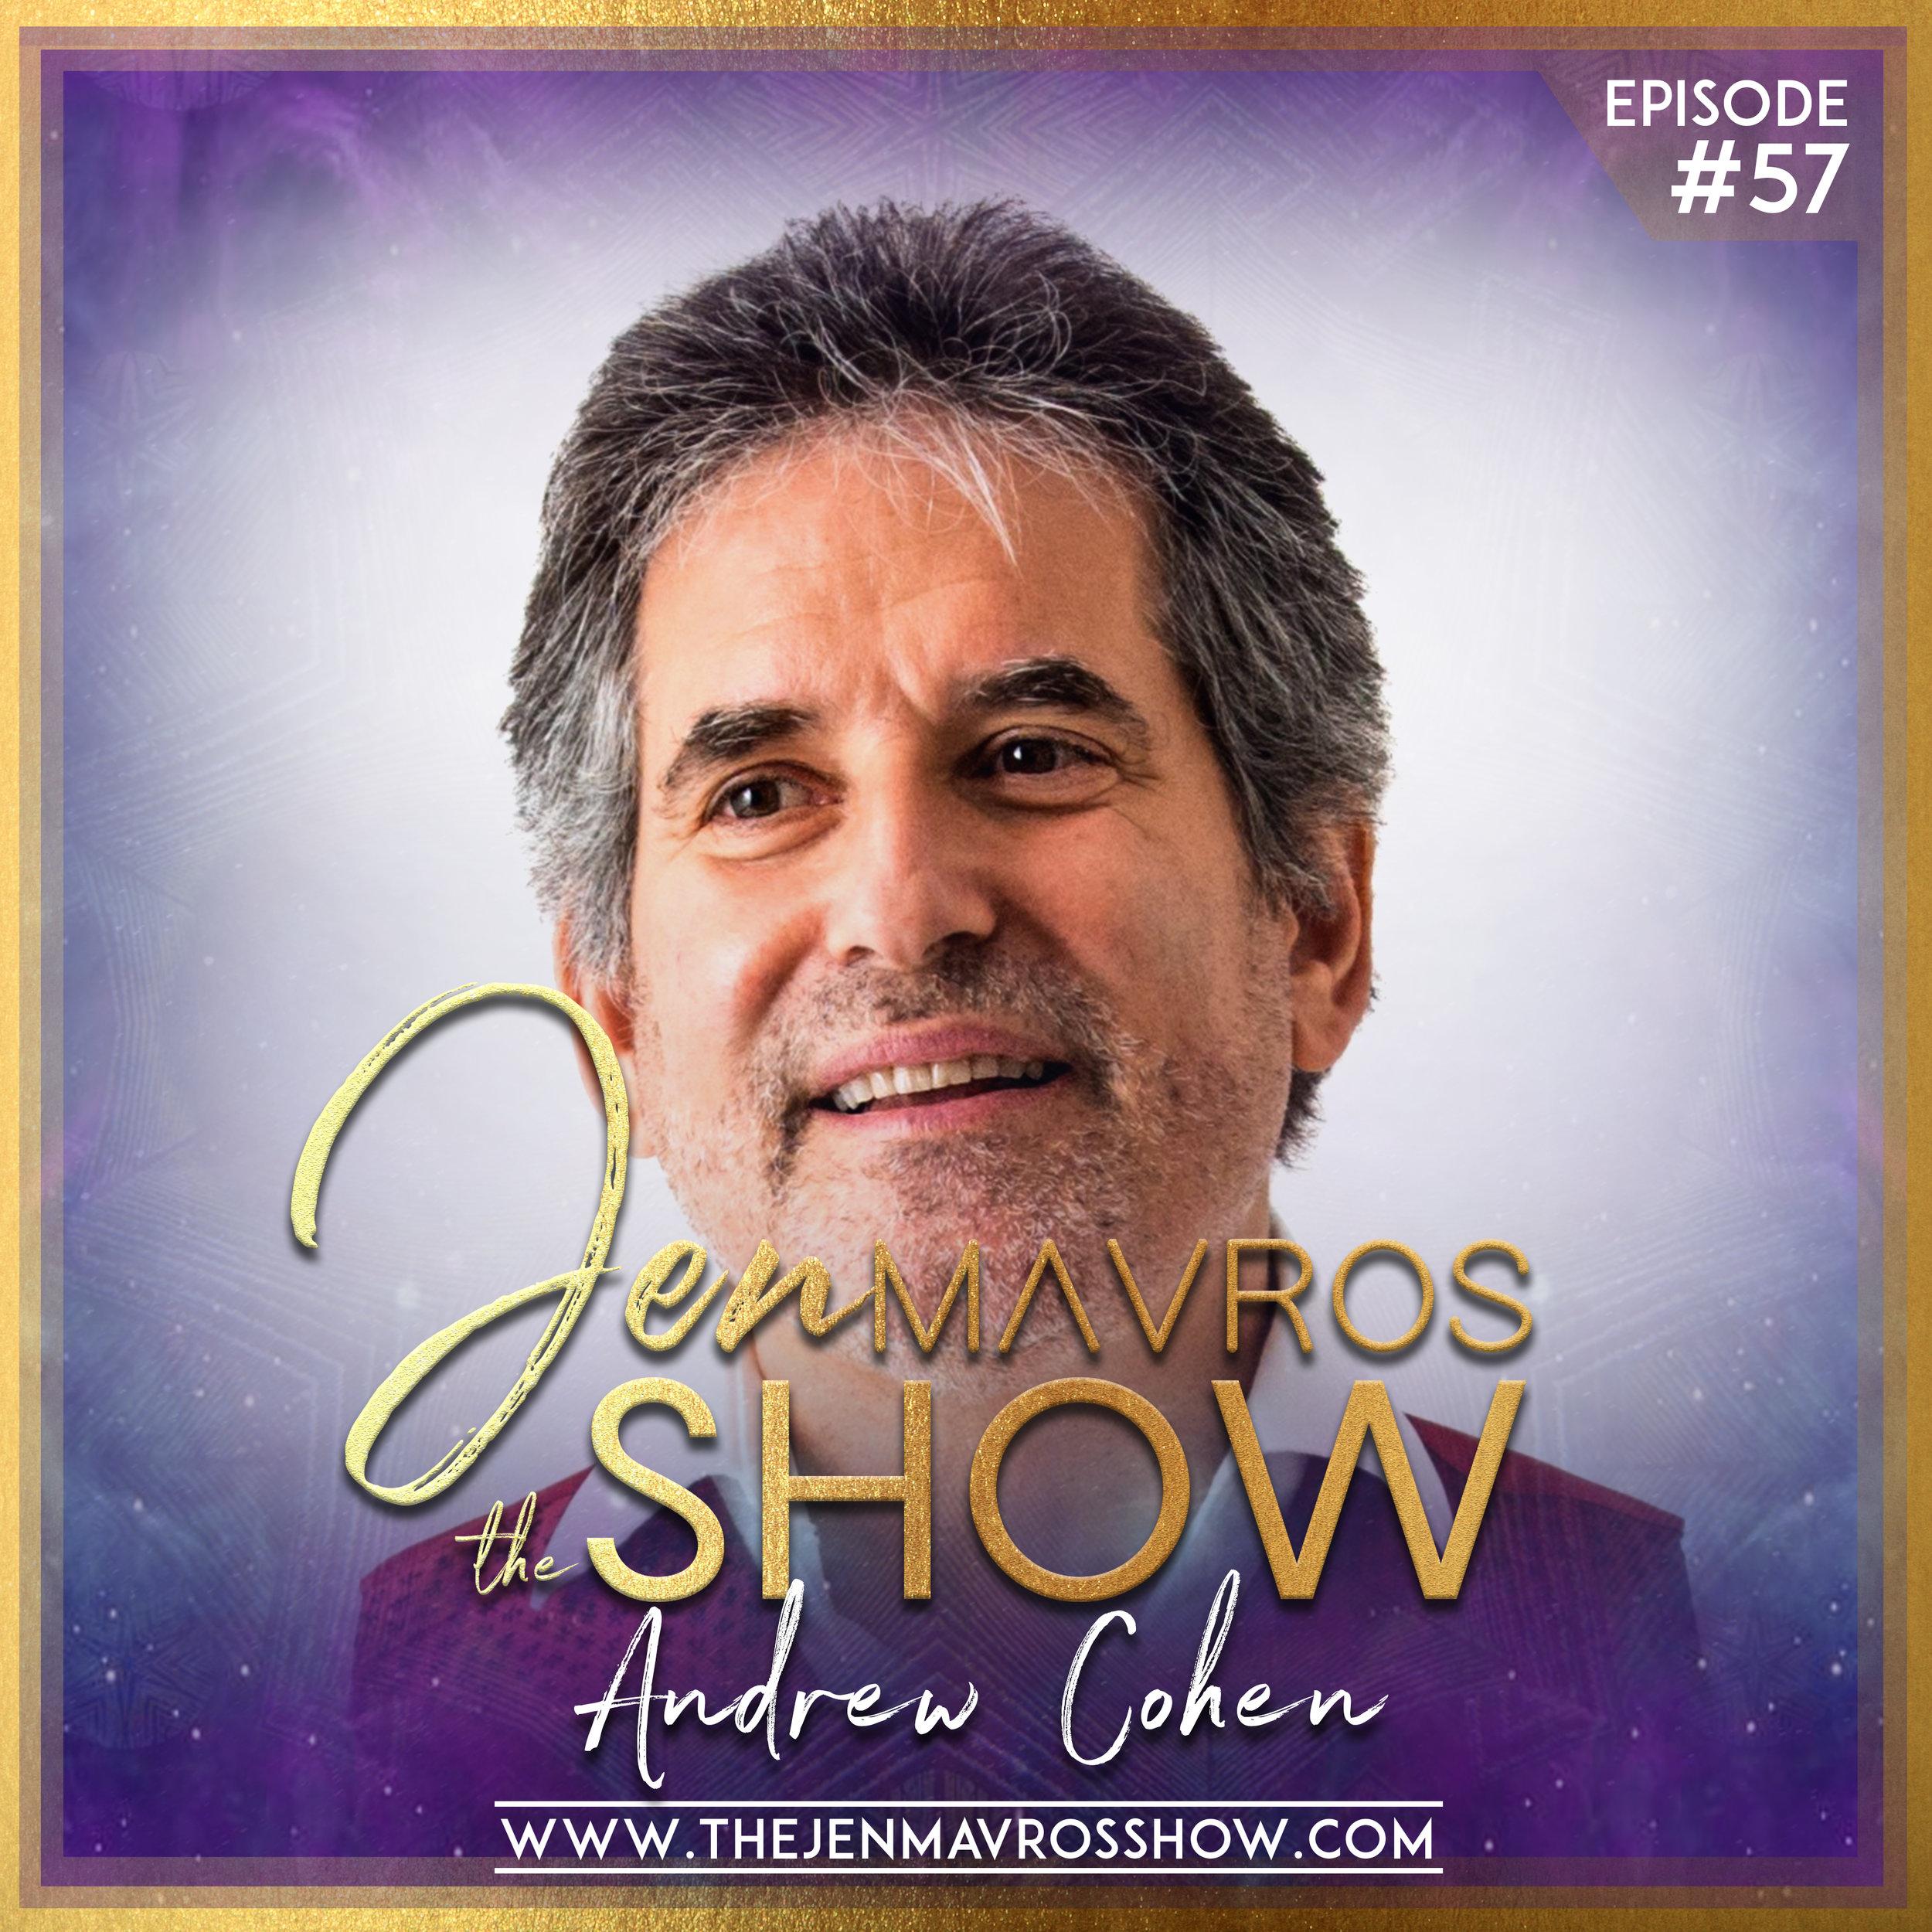 Andrew Cohen - Evolutionary Enlightenment & Cosmic Consciousness